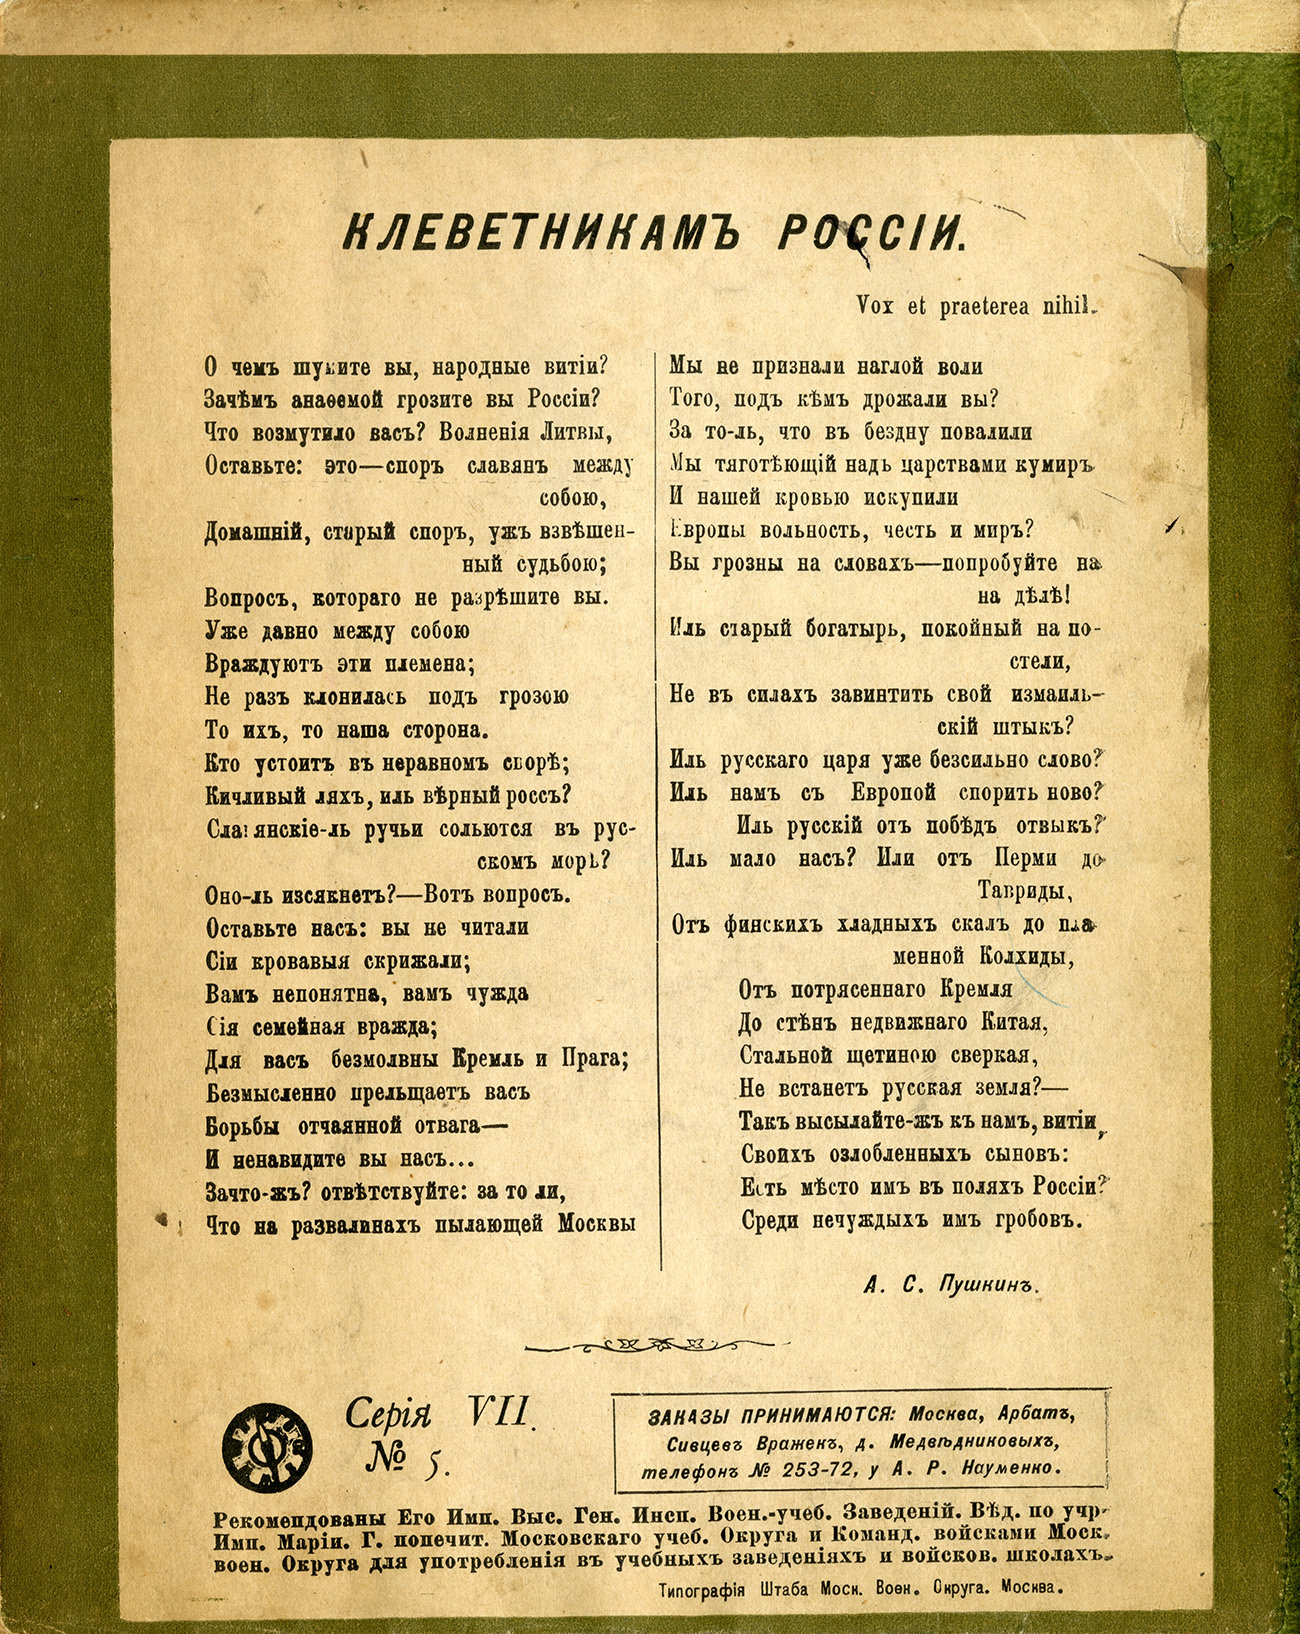 Тетрадь Пушкин 1909 оборот